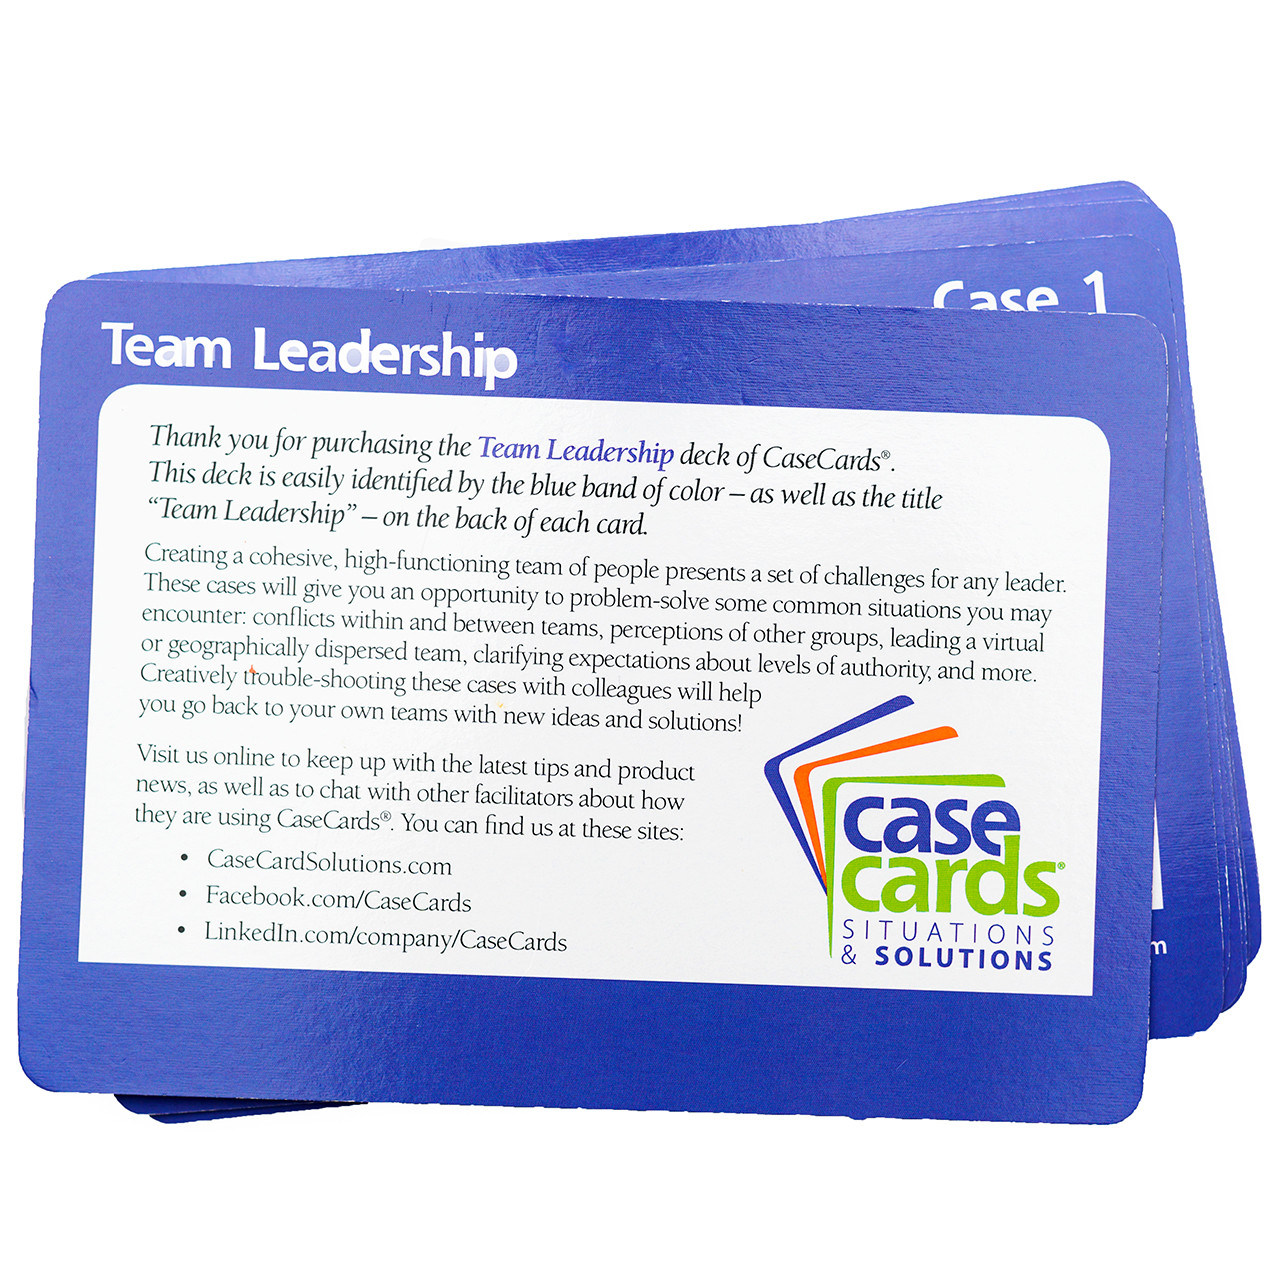 CaseCards - Team Leadership Back